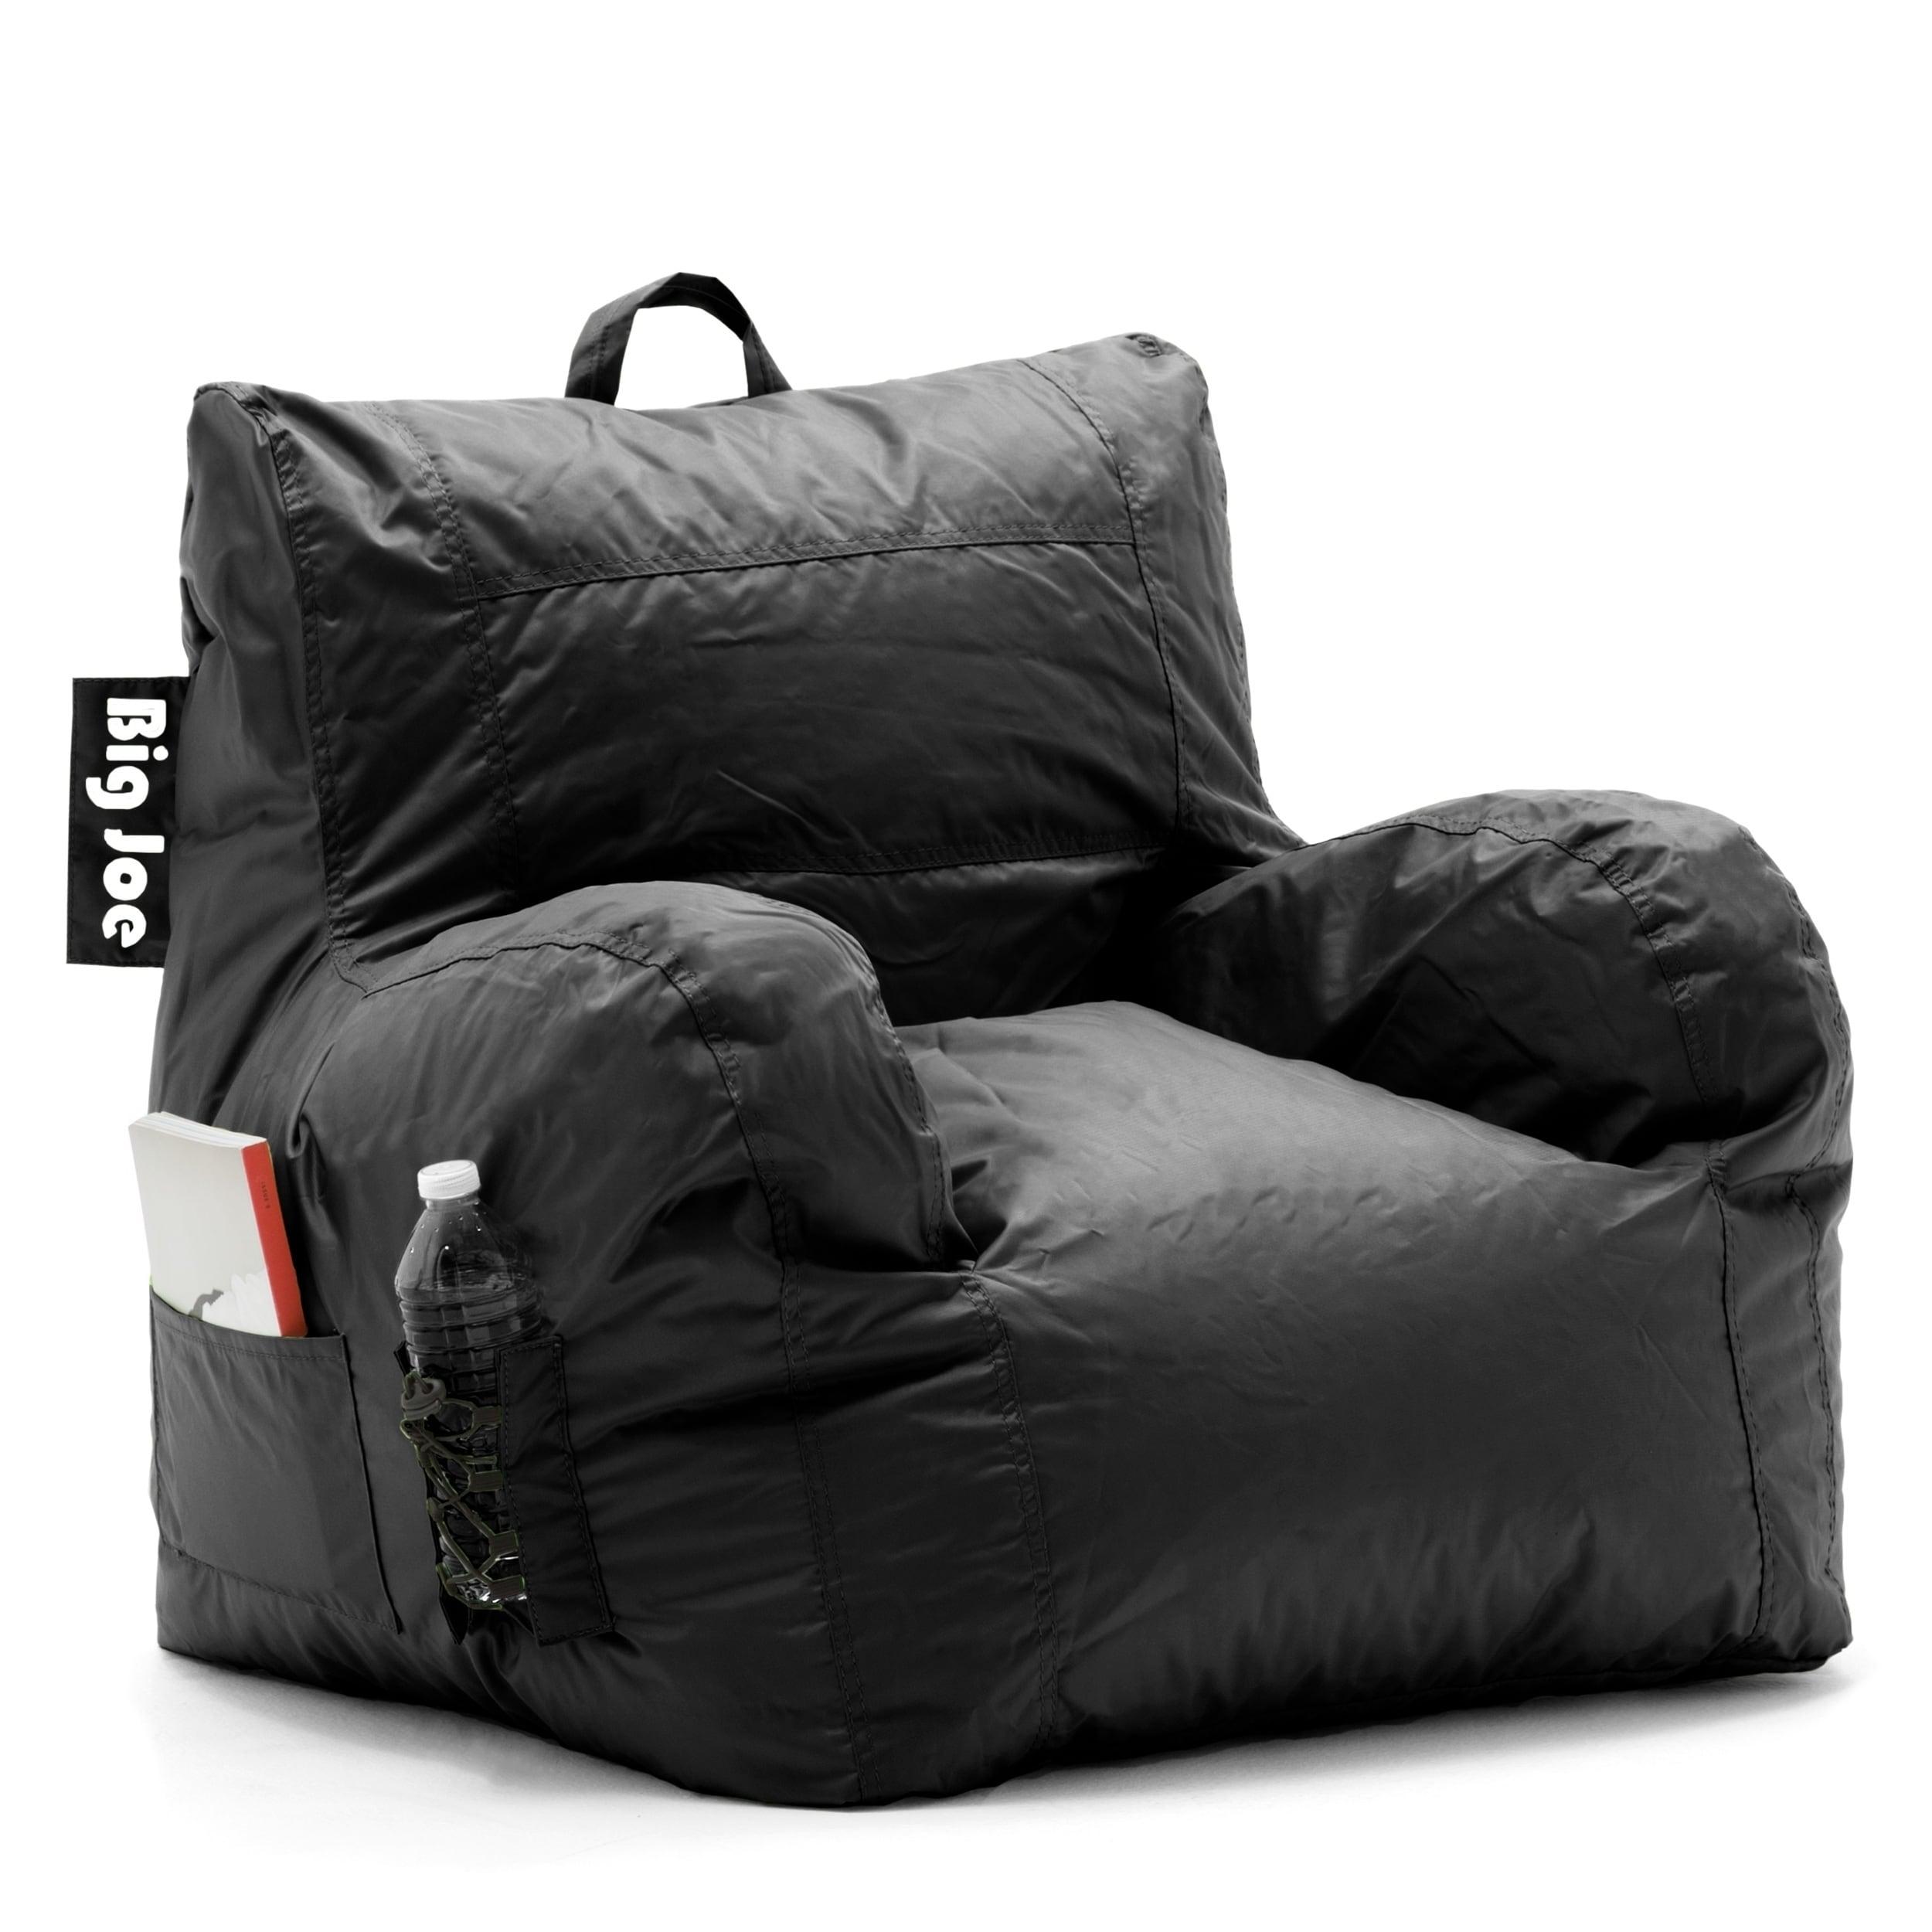 Joe Dorm Bean Bag Chair Black Microsuede Polystyrene Beads